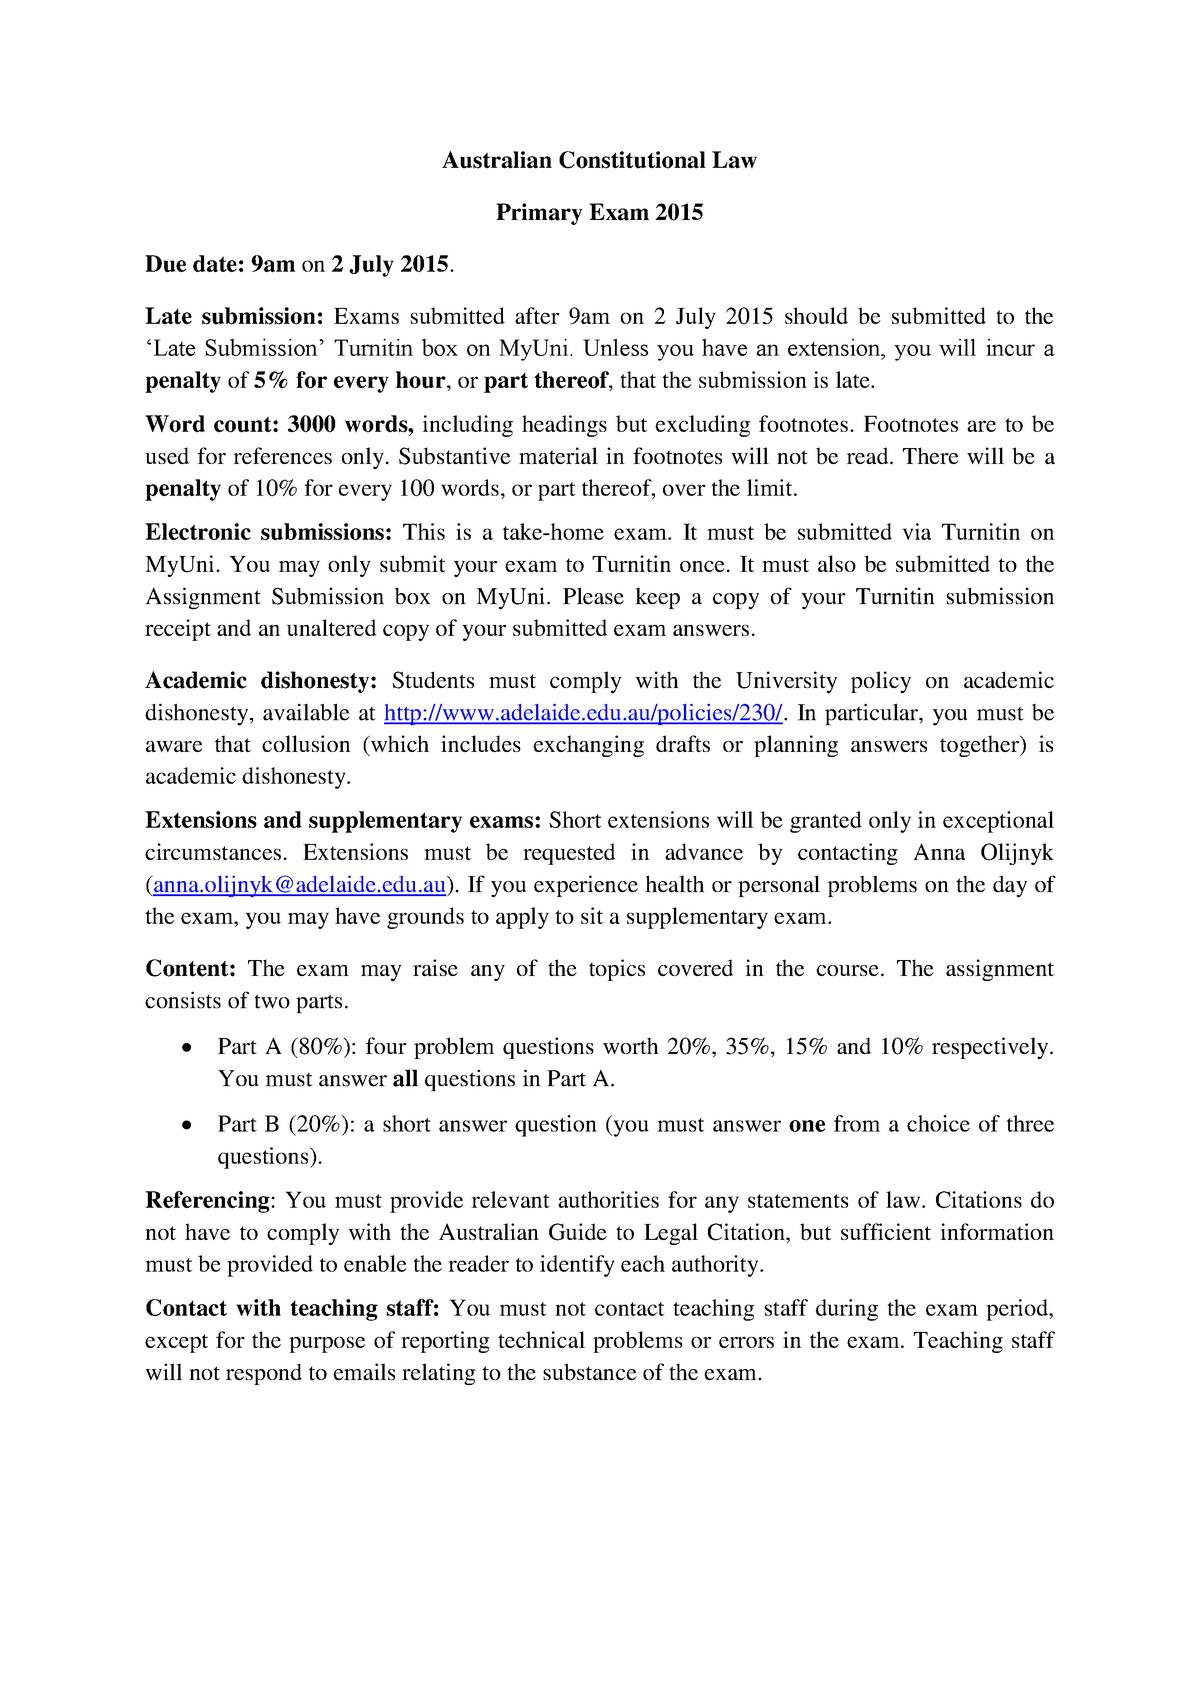 Exam 2015 - LAW 2501: Australian Constitutional Law - StuDocu